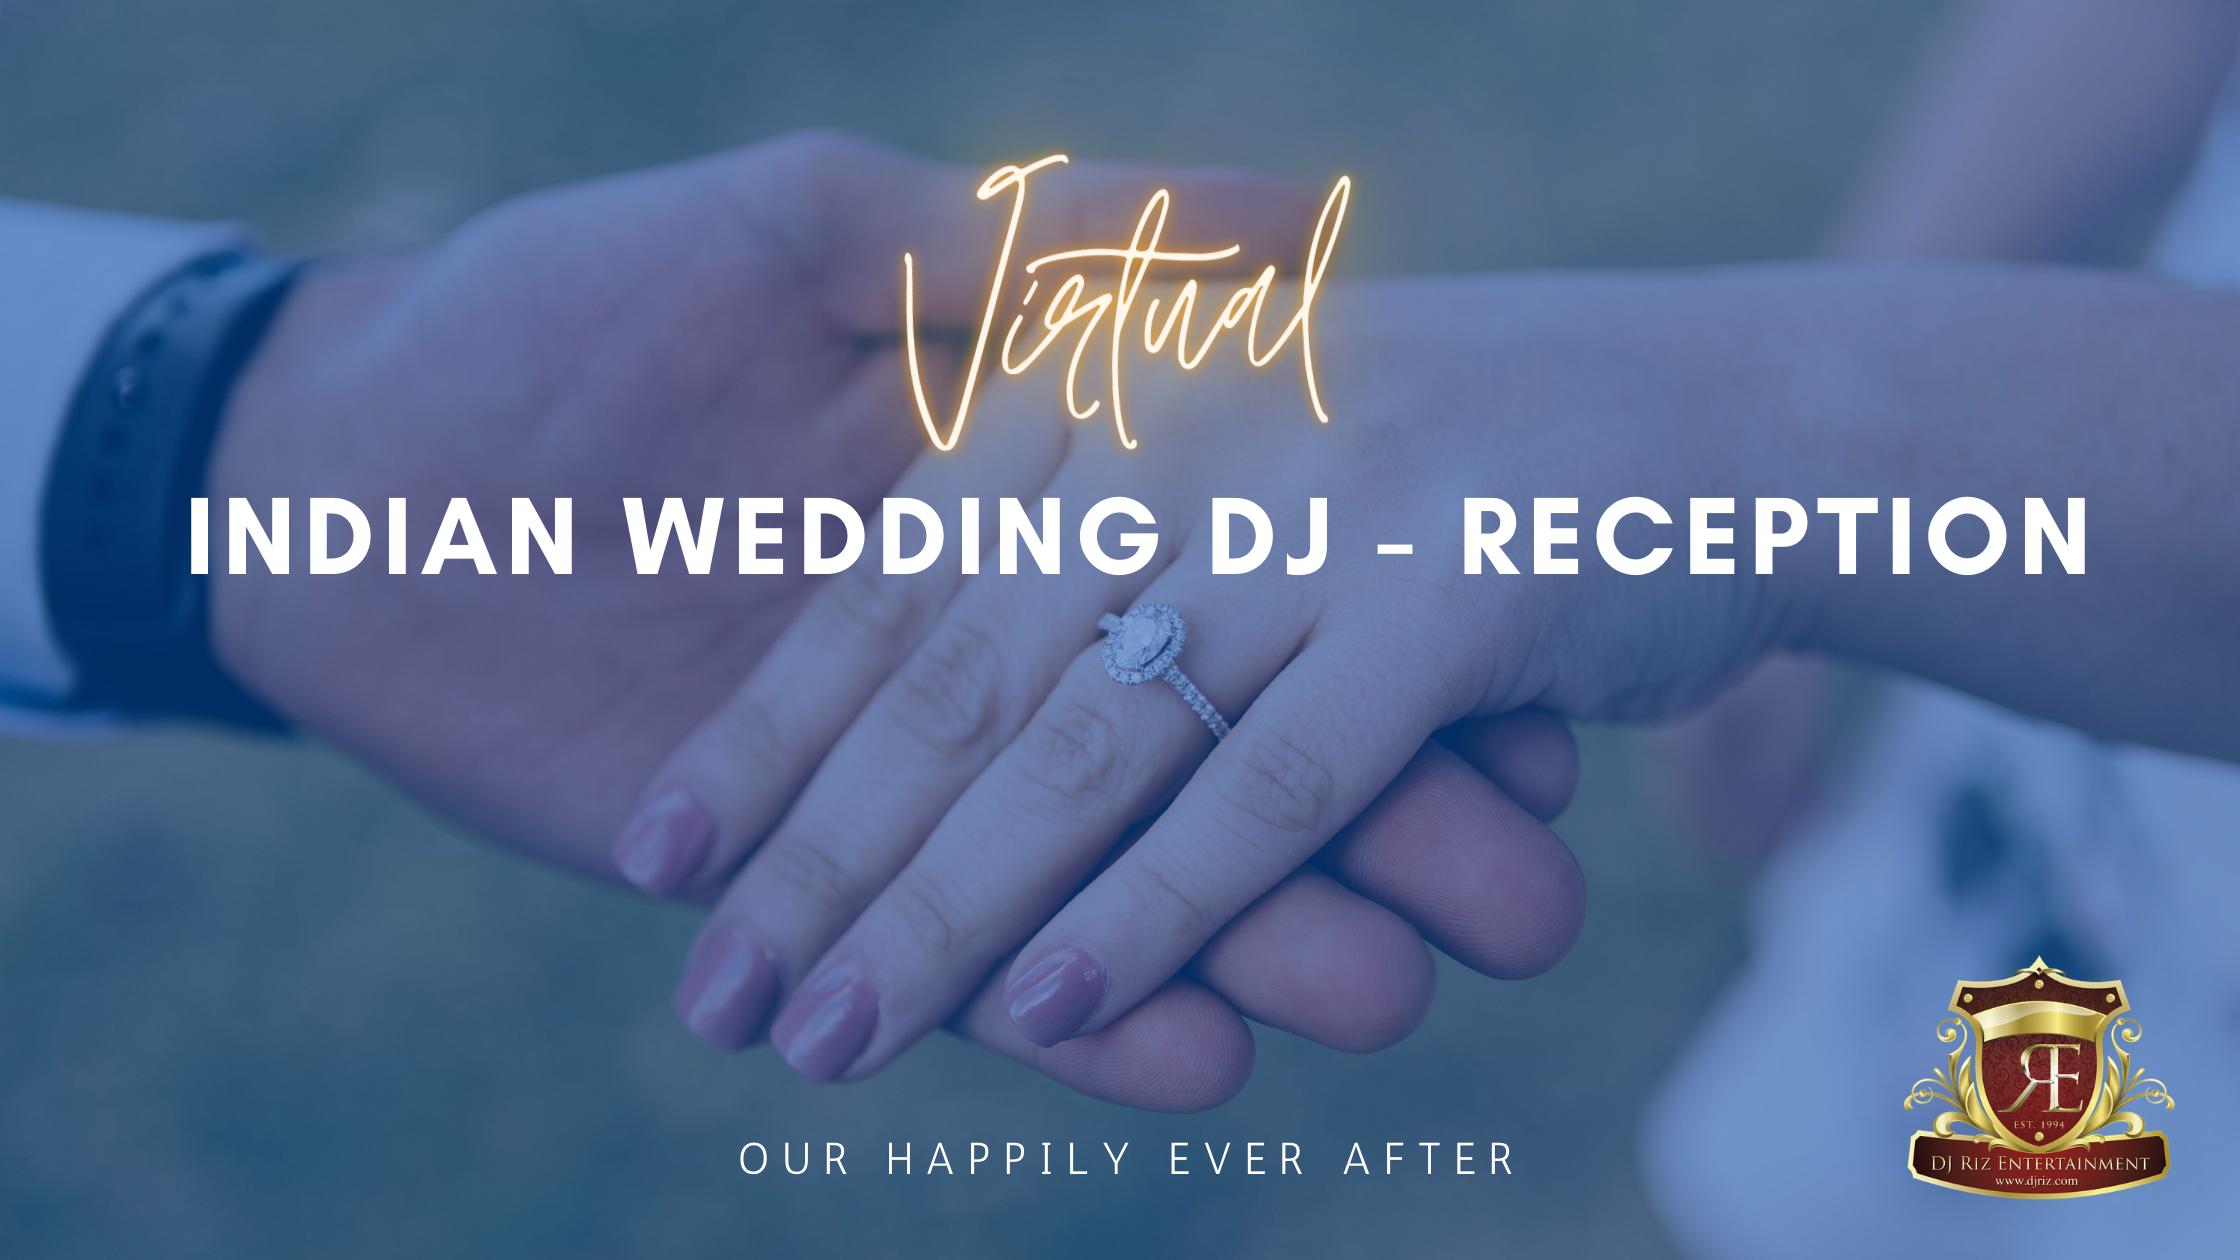 Virtual Indian Wedding DJ Reception